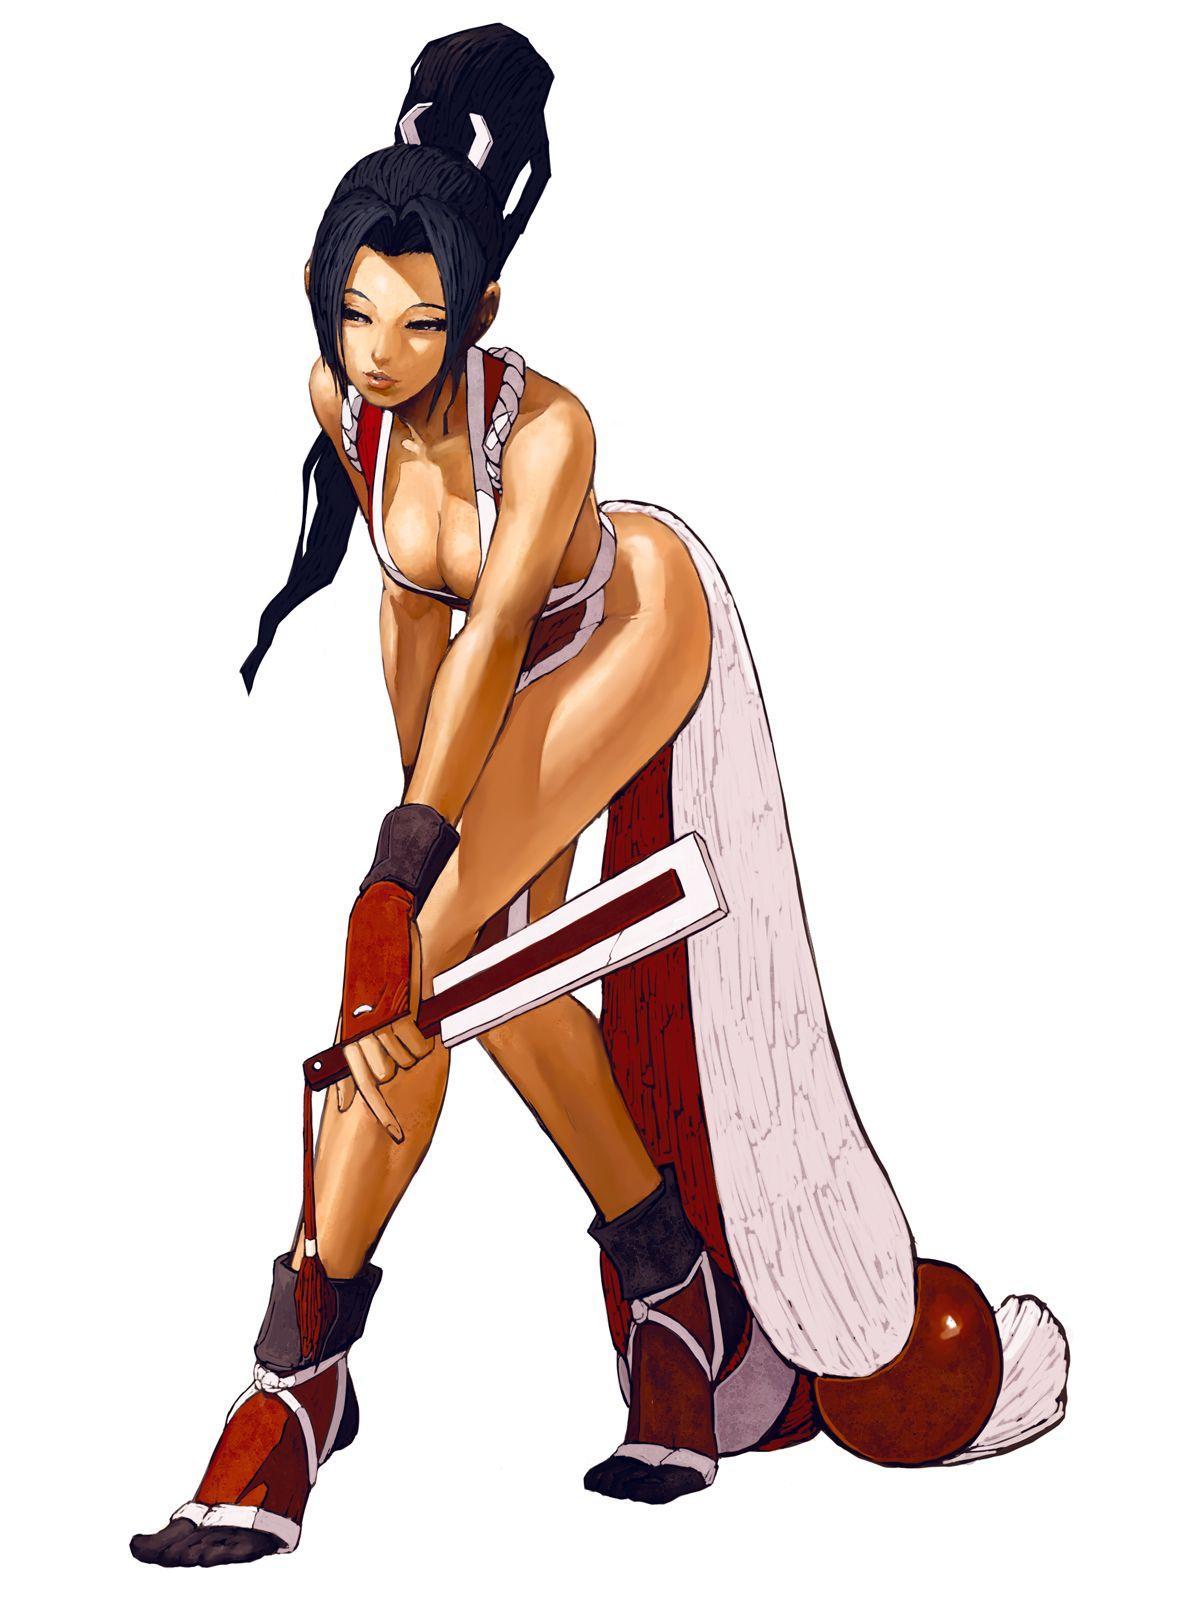 Kof 2002 Mai Shiranui Jpg 1200 1600 Mai Kof Kof Capcom Vs Snk